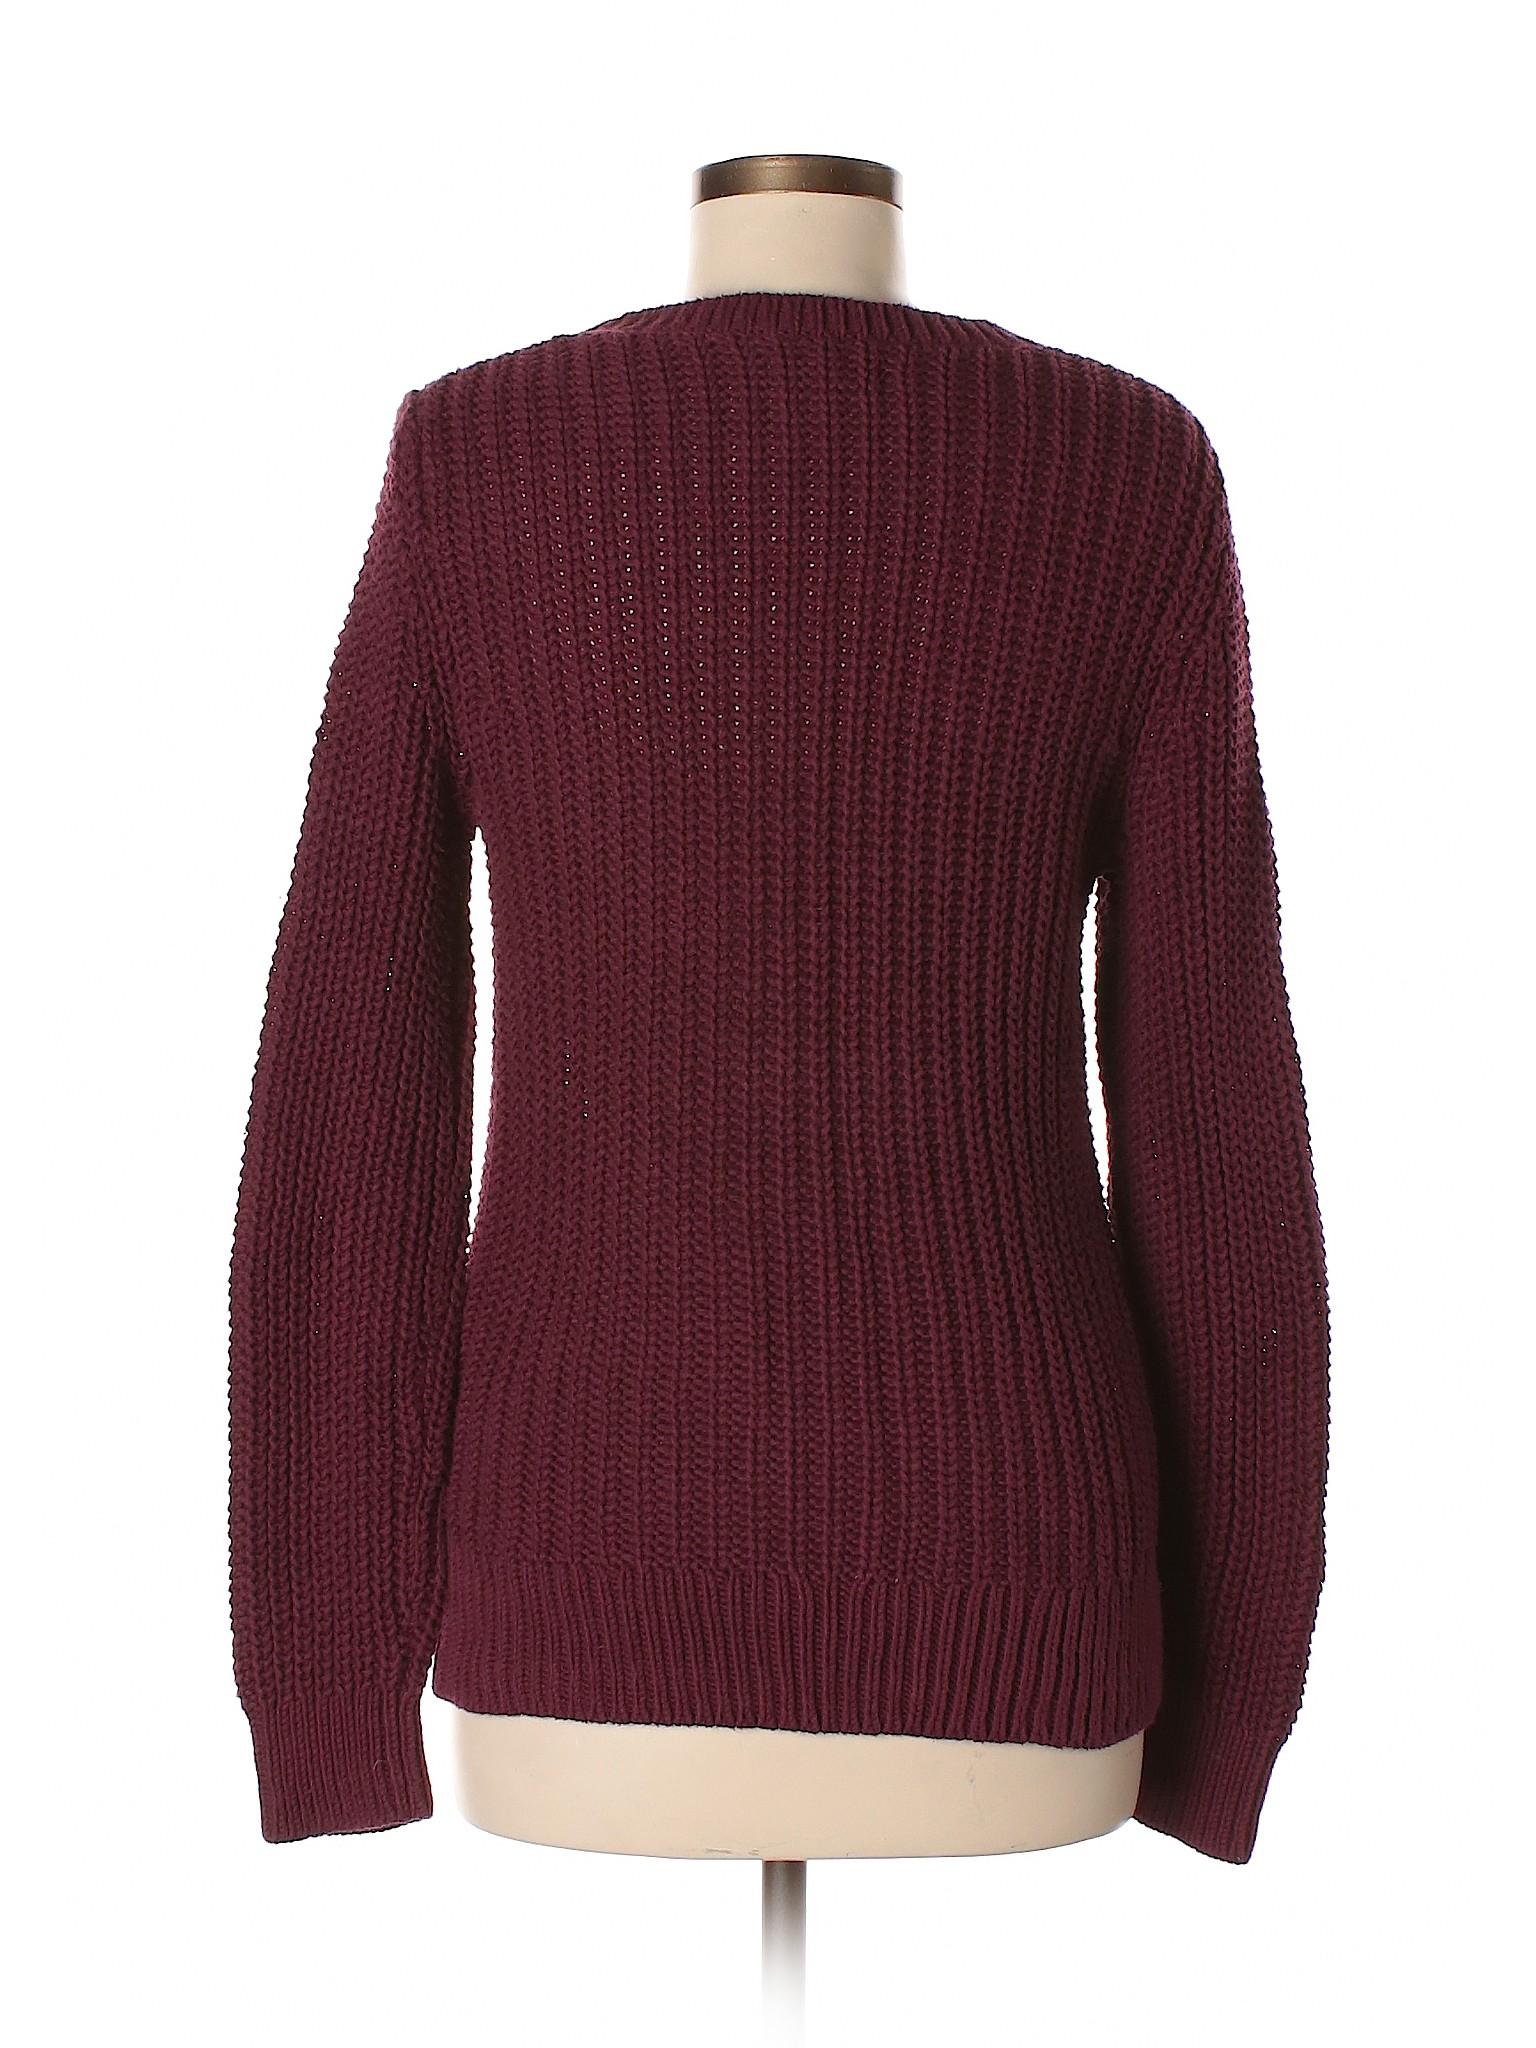 Nautica Nautica Boutique Sweater Boutique Pullover Sweater Pullover Pullover Nautica Boutique q1wft